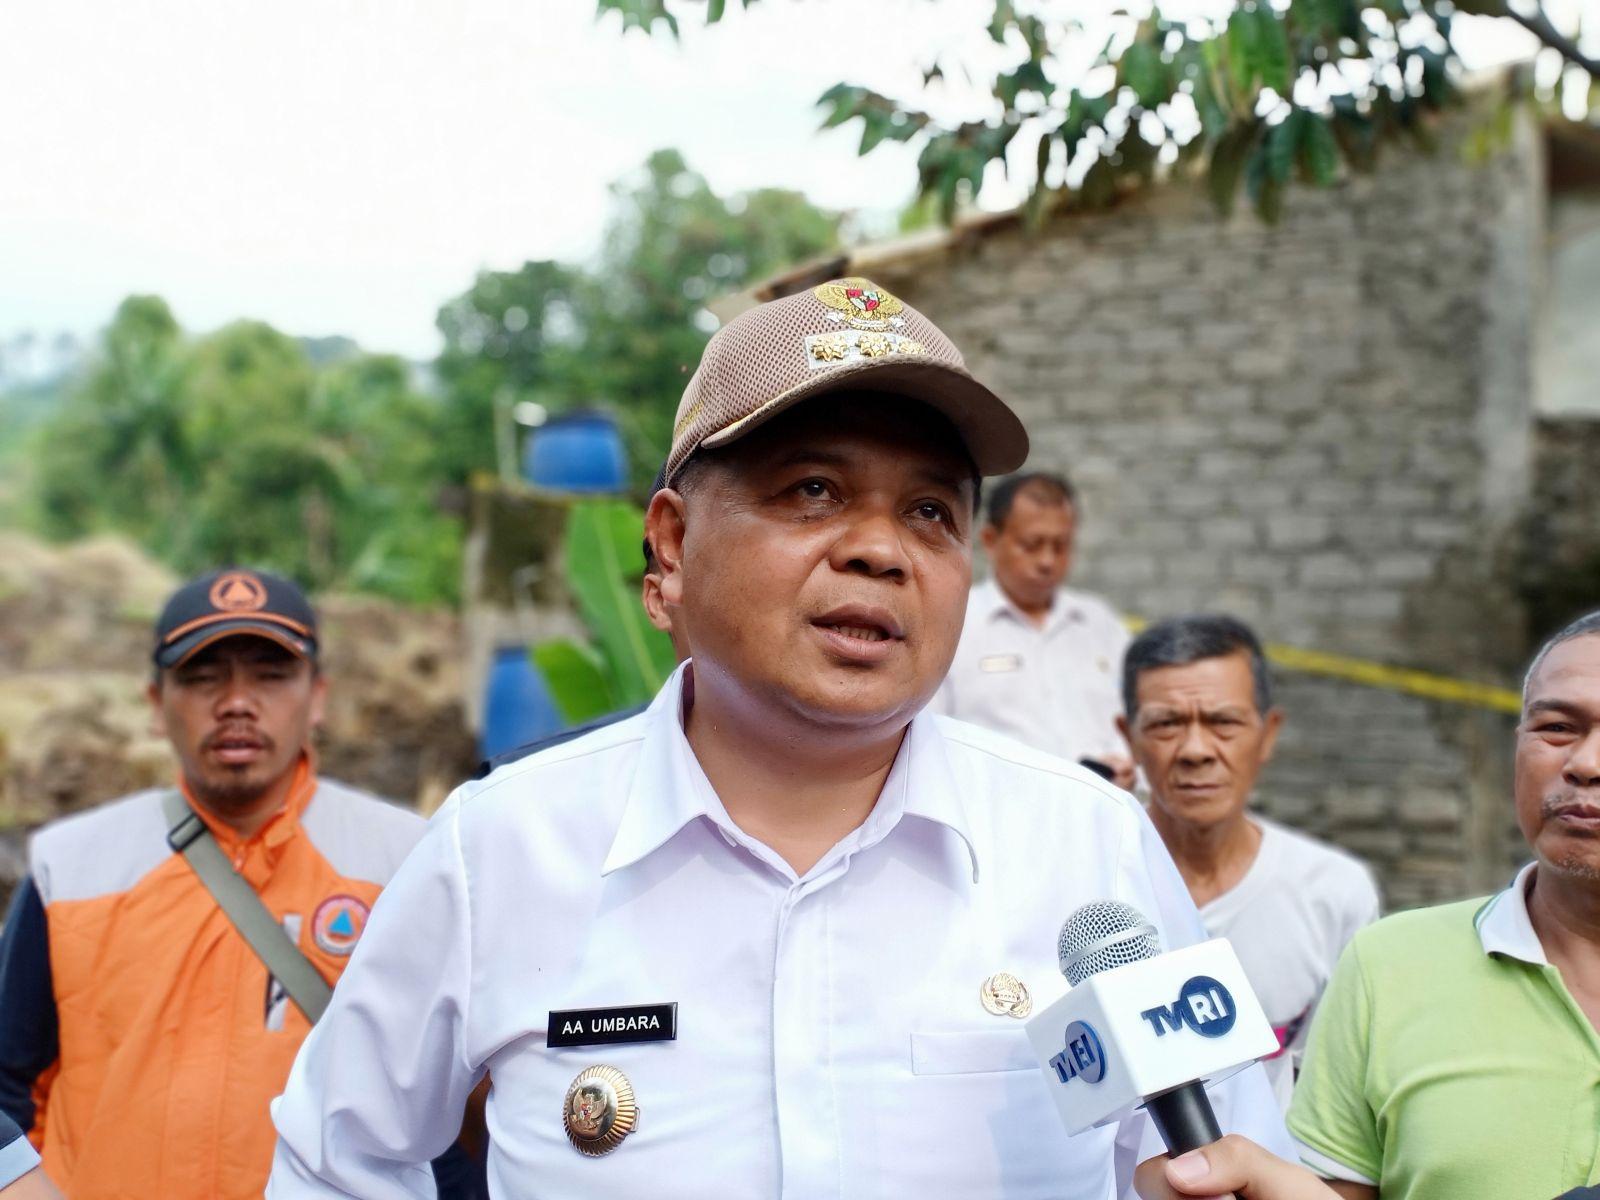 Bupati Bandung Barat Kaget Wilayahnya Jadi Zona Merah Covid 19